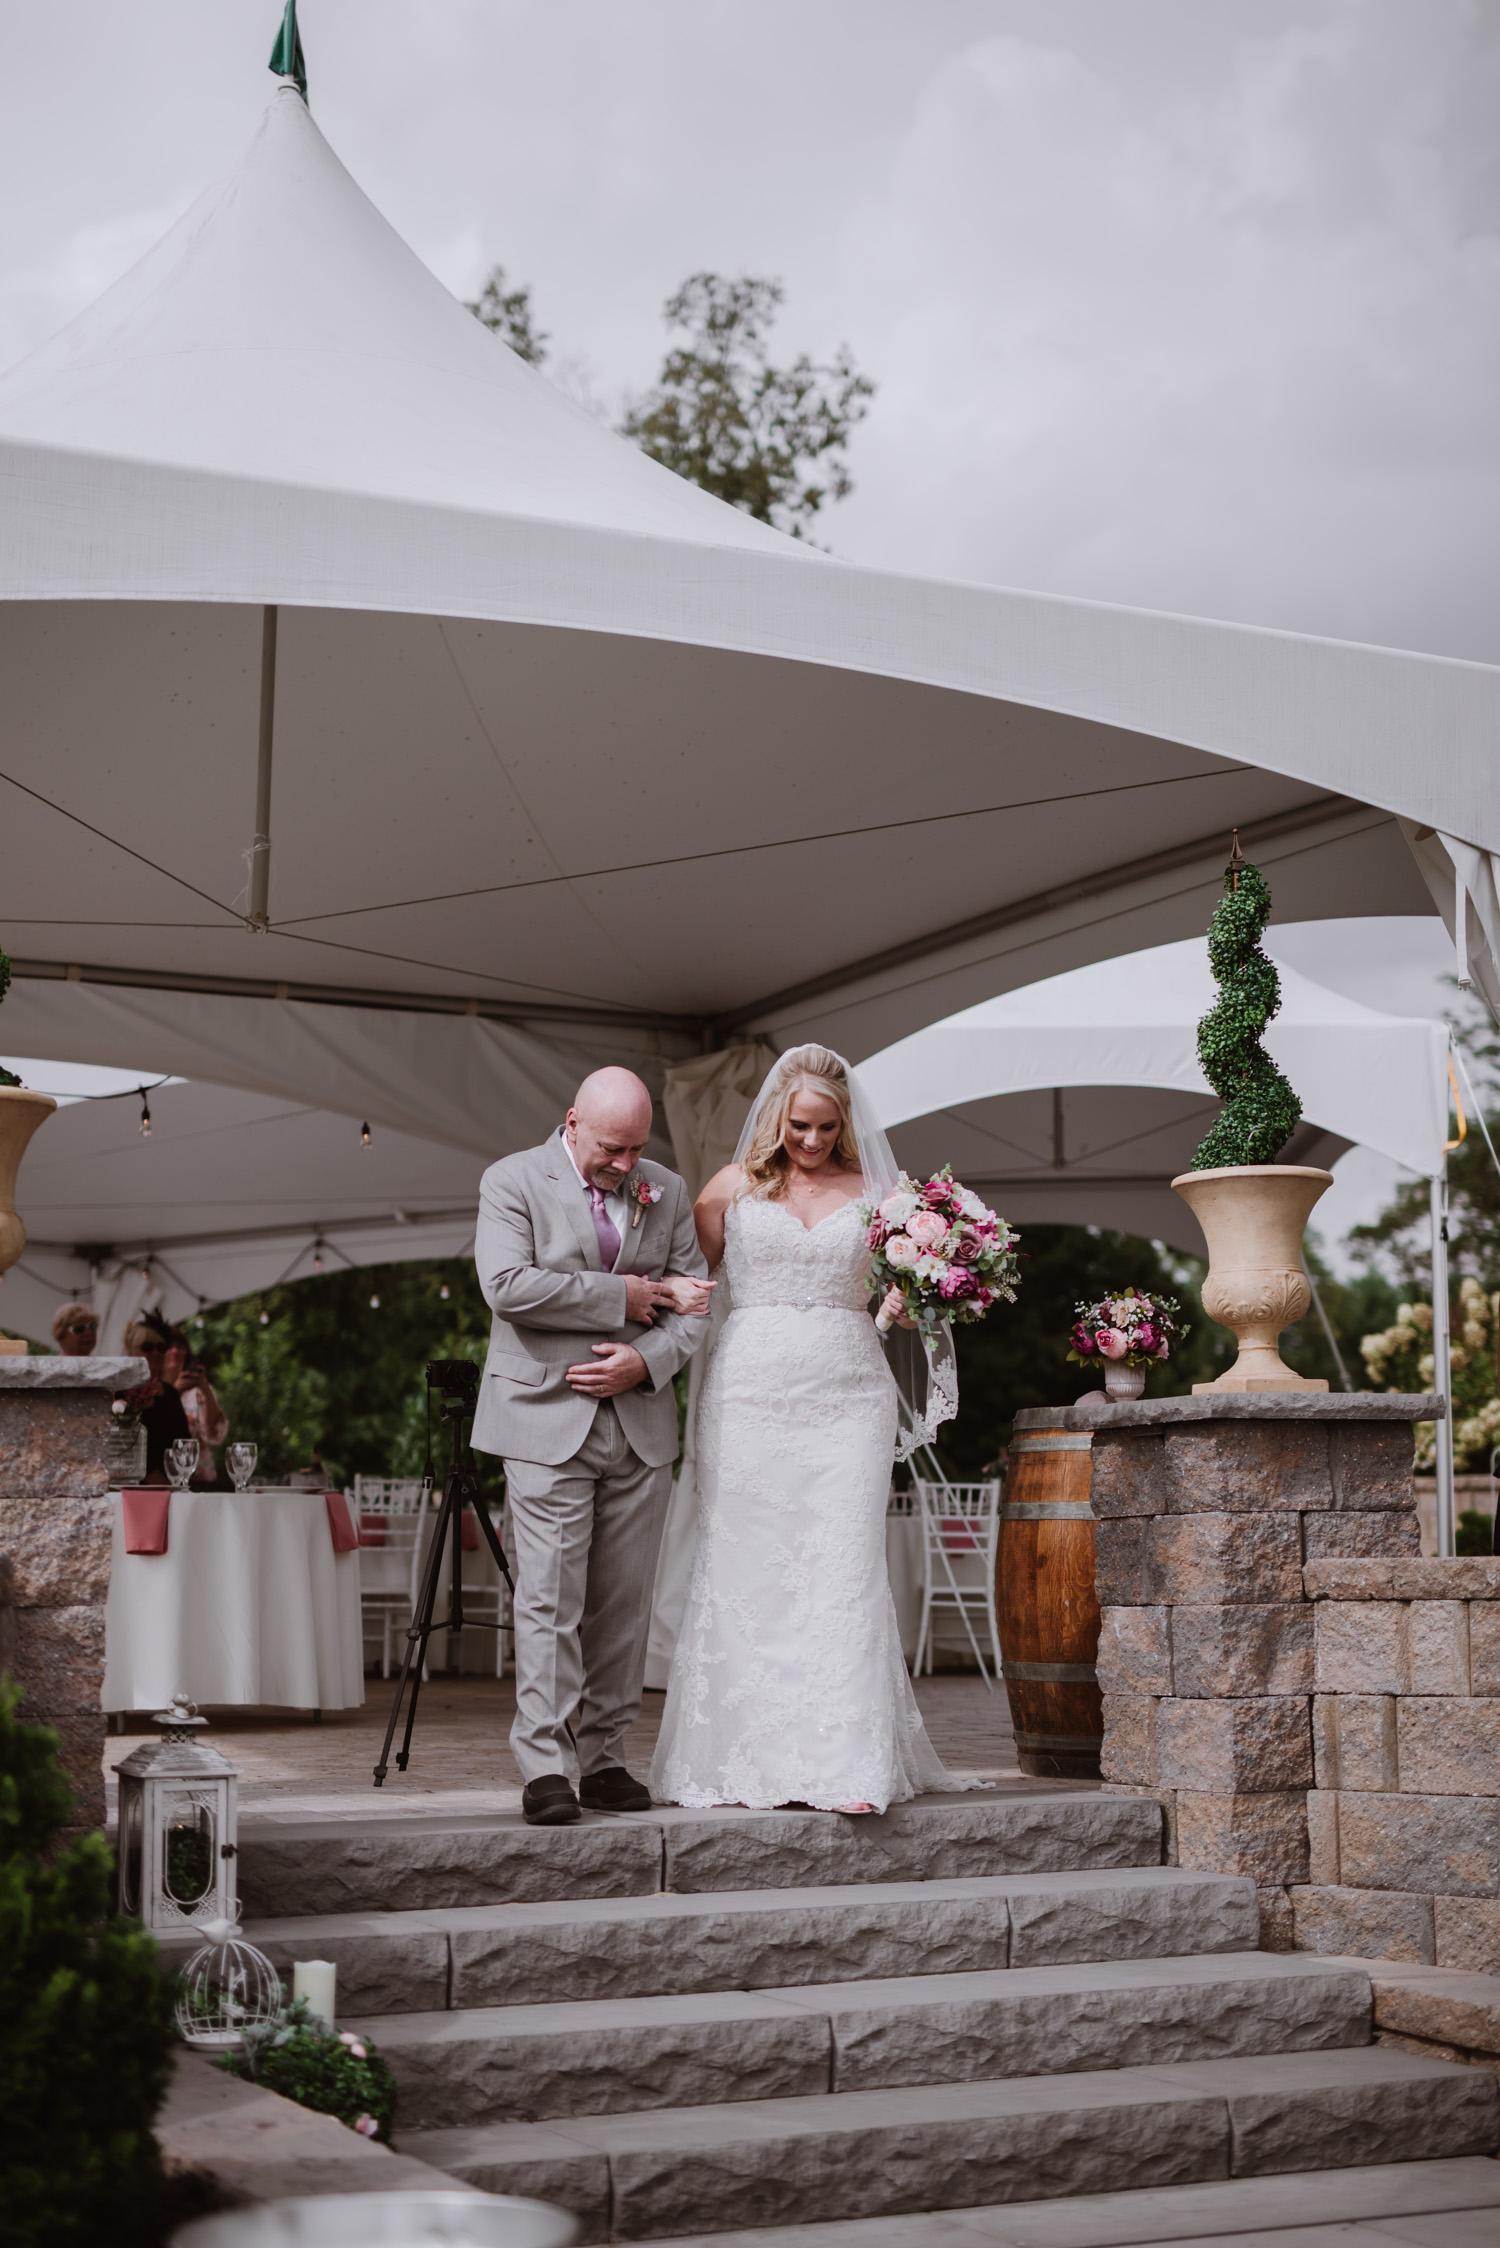 Wedding Ceremony by Kayli LaFon Photography | Greensboro Winston-Salem, NC Wedding Photographer | The Hideaway at Crooked Creek, Whitsett